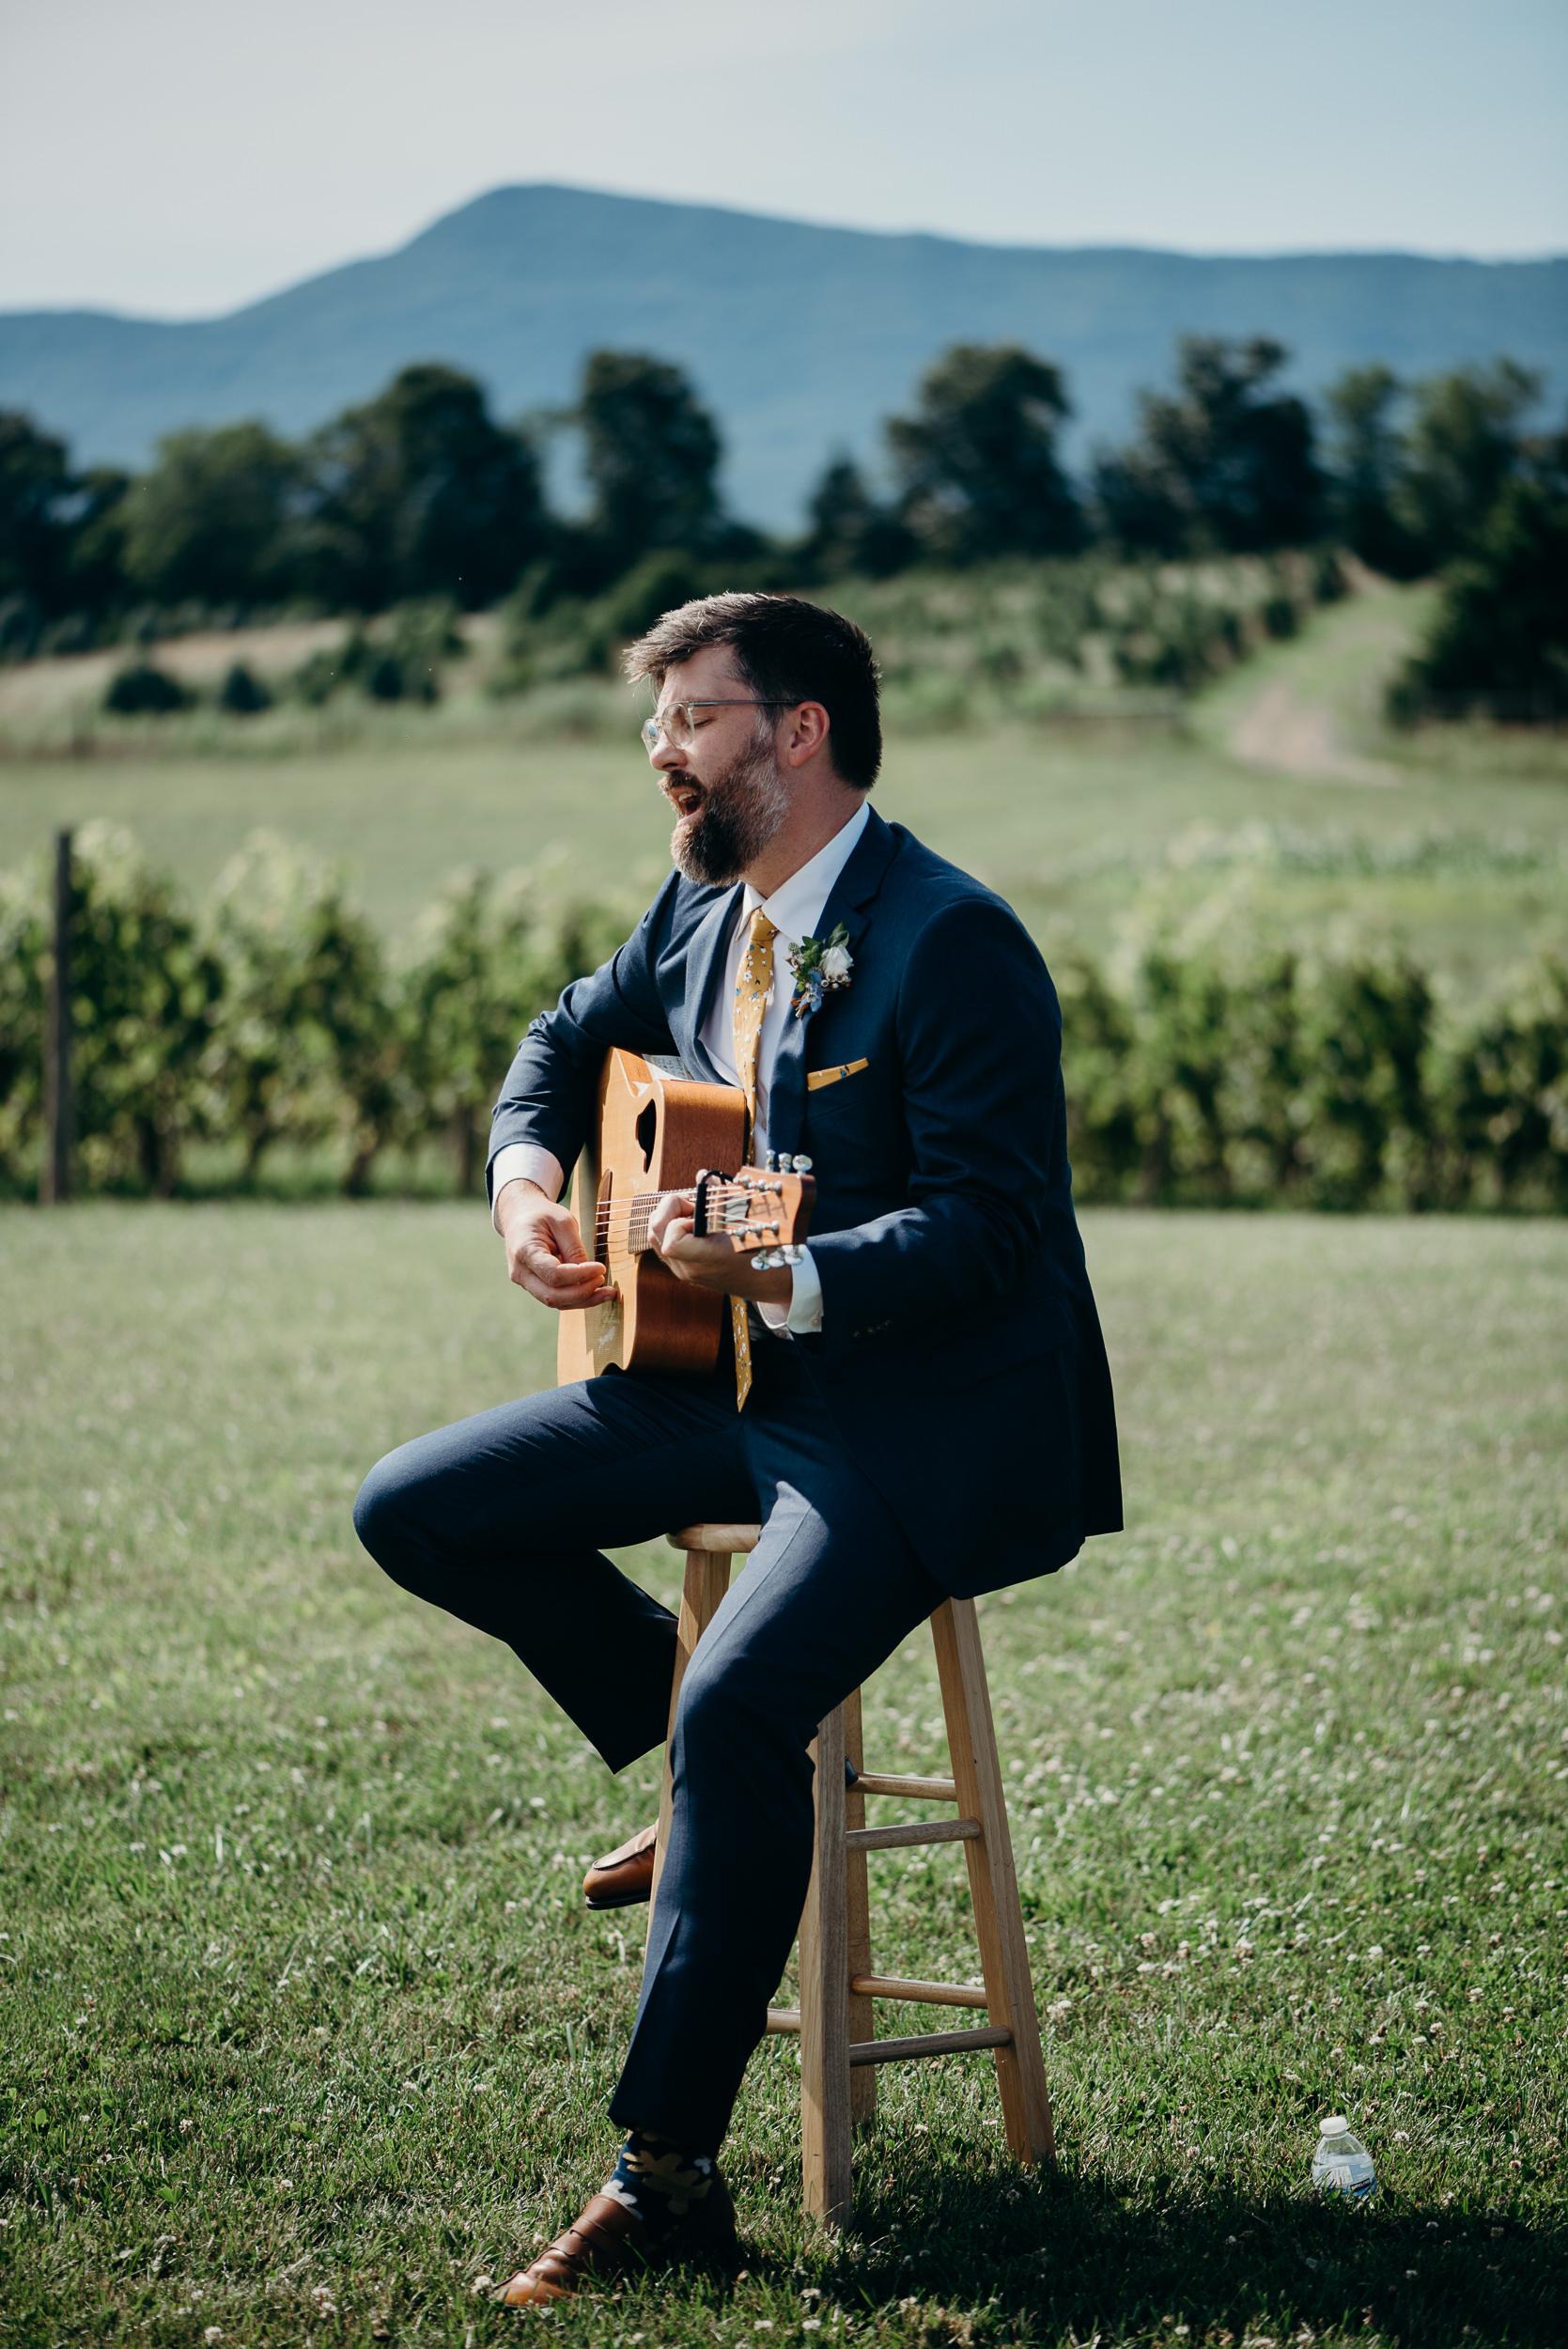 110-faithbrooke-barn-vineyard-wedding-photo-mustard-yellow-navy-motorcycle-MMG_9391.jpg